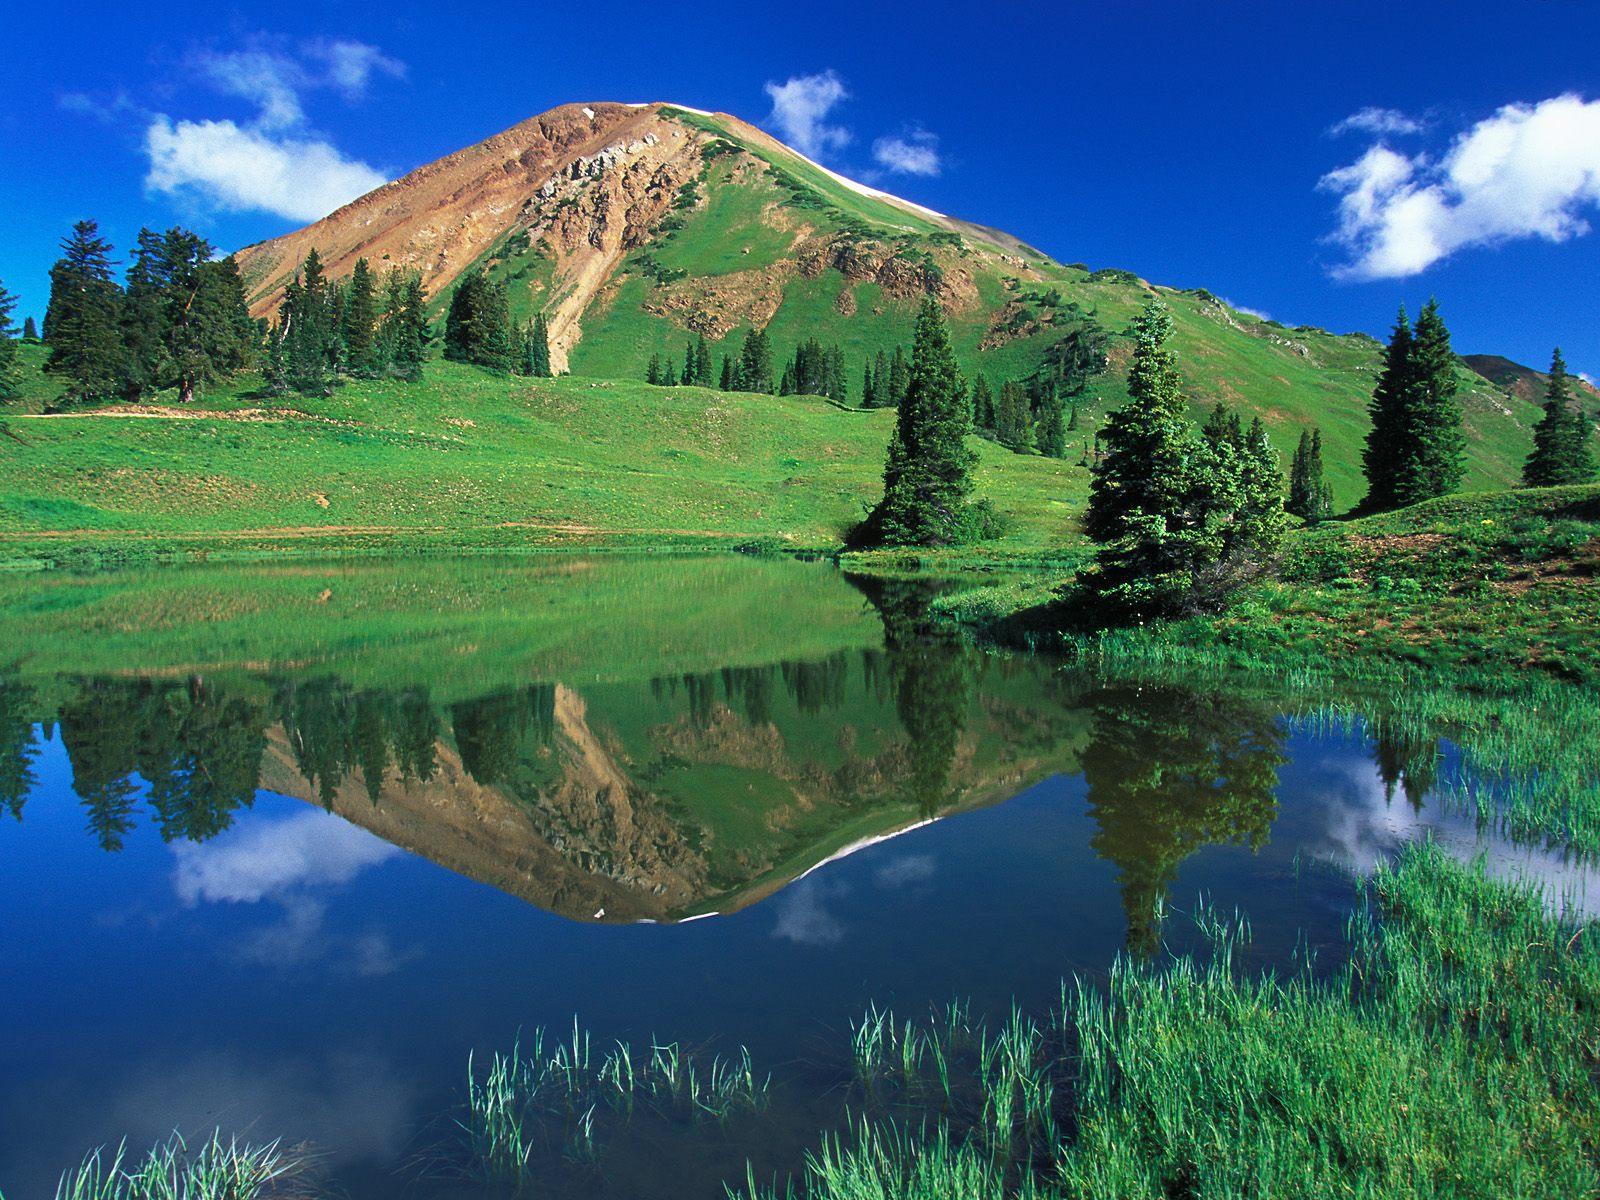 mountain and the greenary - photo #35